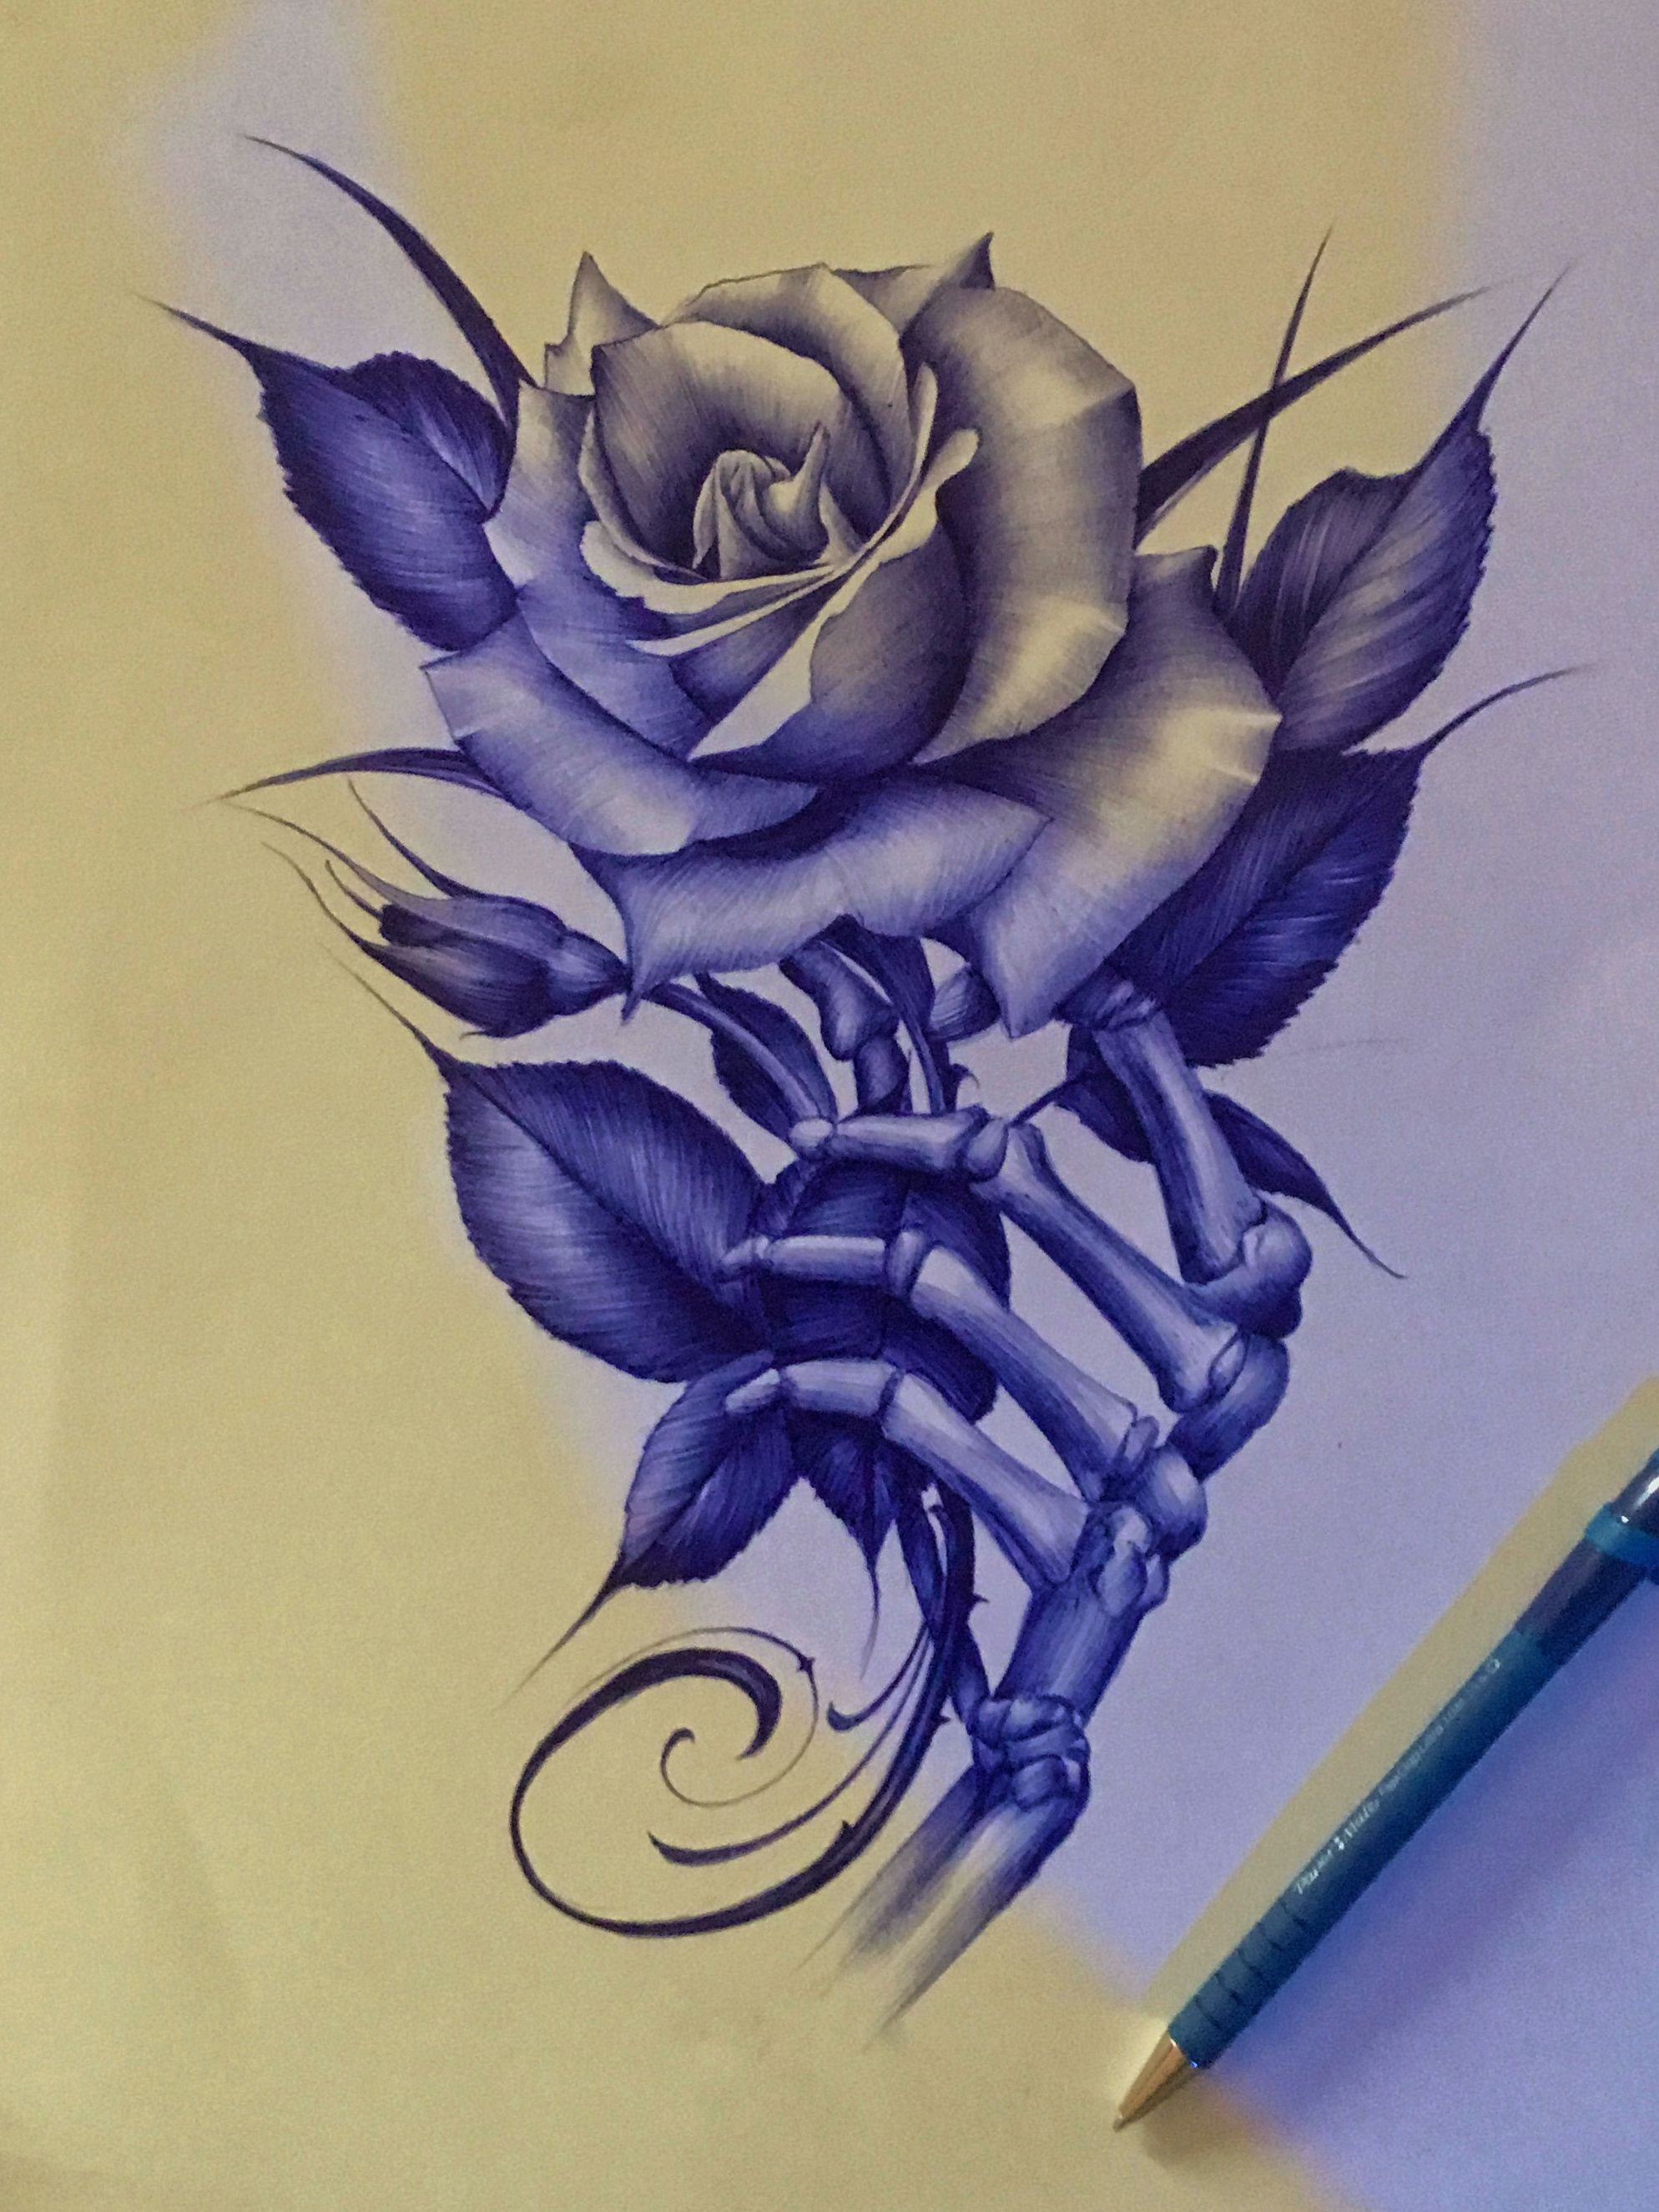 Rose Dessin Tattoo : pin oleh hongtie di tattoos pinterest tatouage dessin ~ Nature-et-papiers.com Idées de Décoration